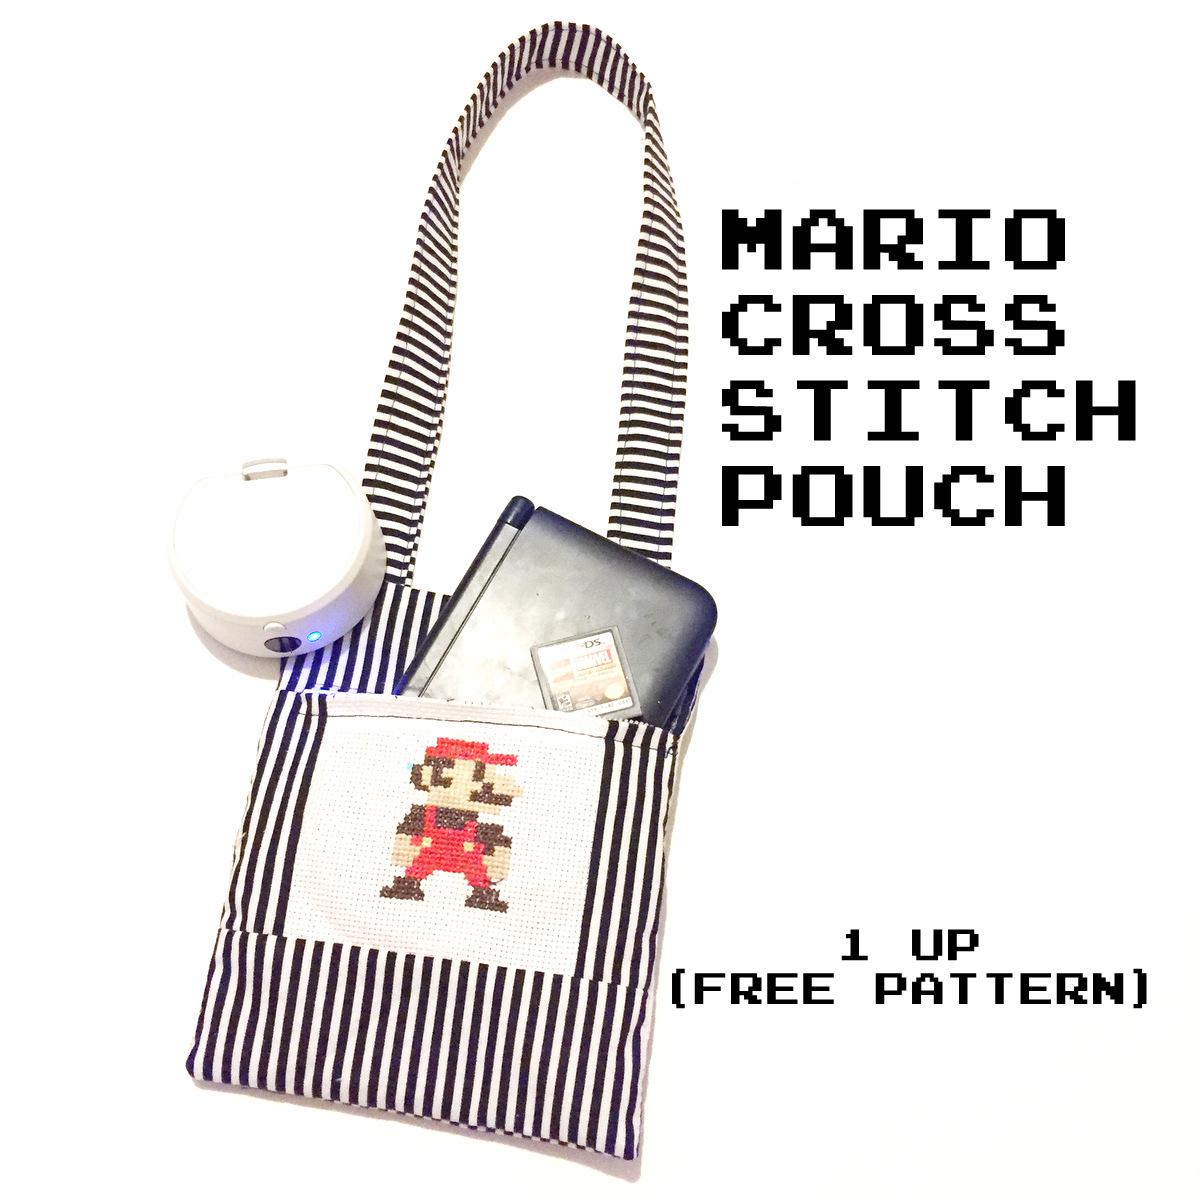 Mario Cross-stitch free pattern | Sewing Mama RaeAnna